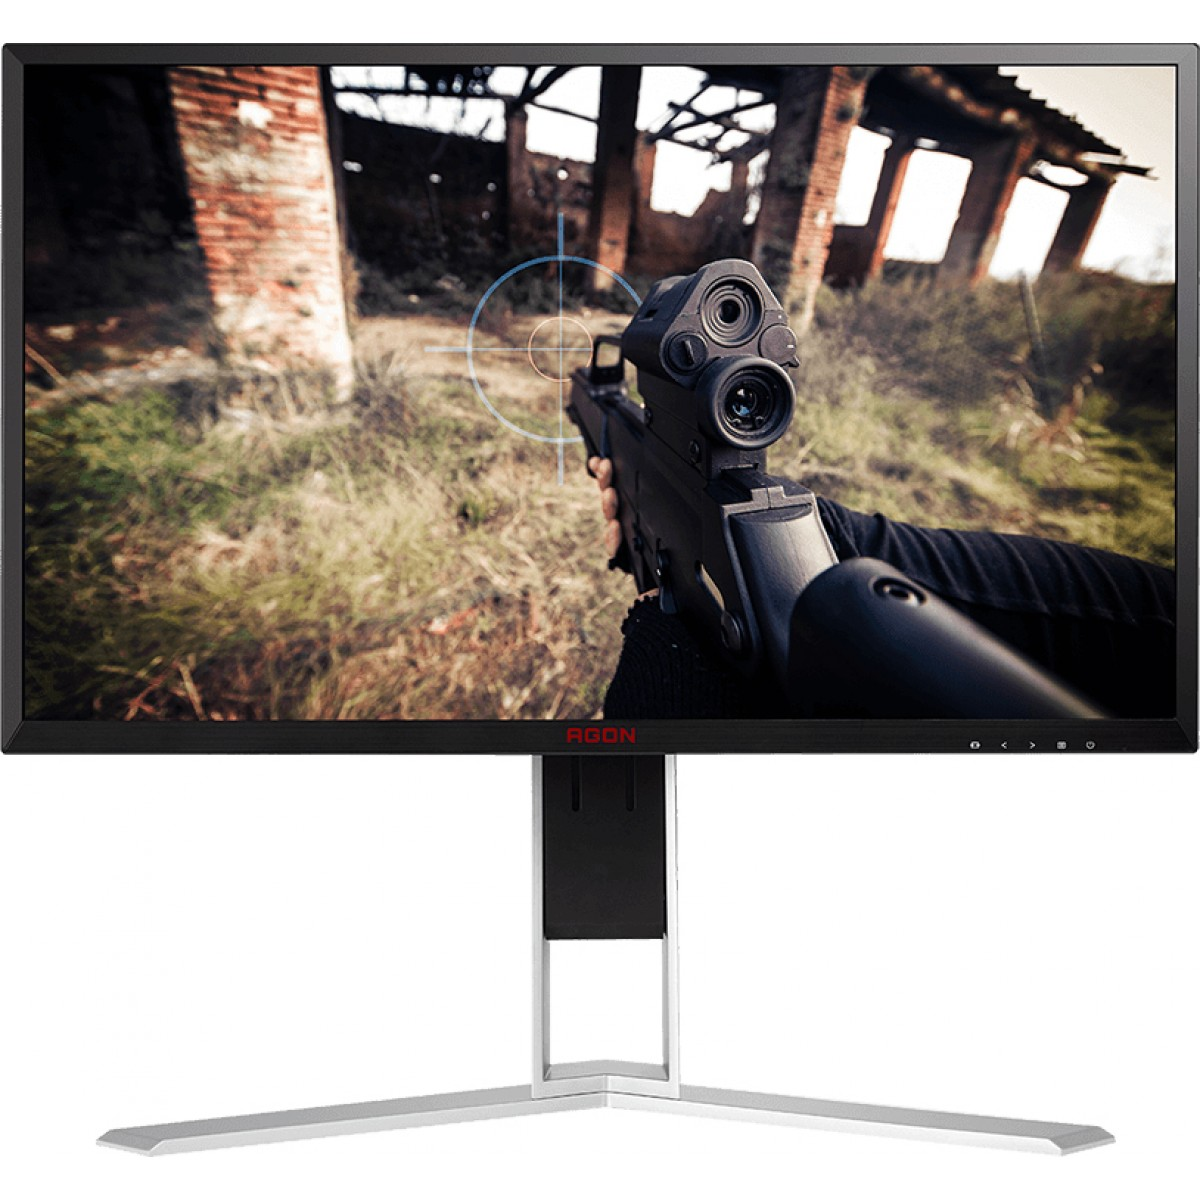 Monitor Gamer AOC  Agon 27 Pol, QUAD HD, 165Mhz, G-SYNC, AG271QG